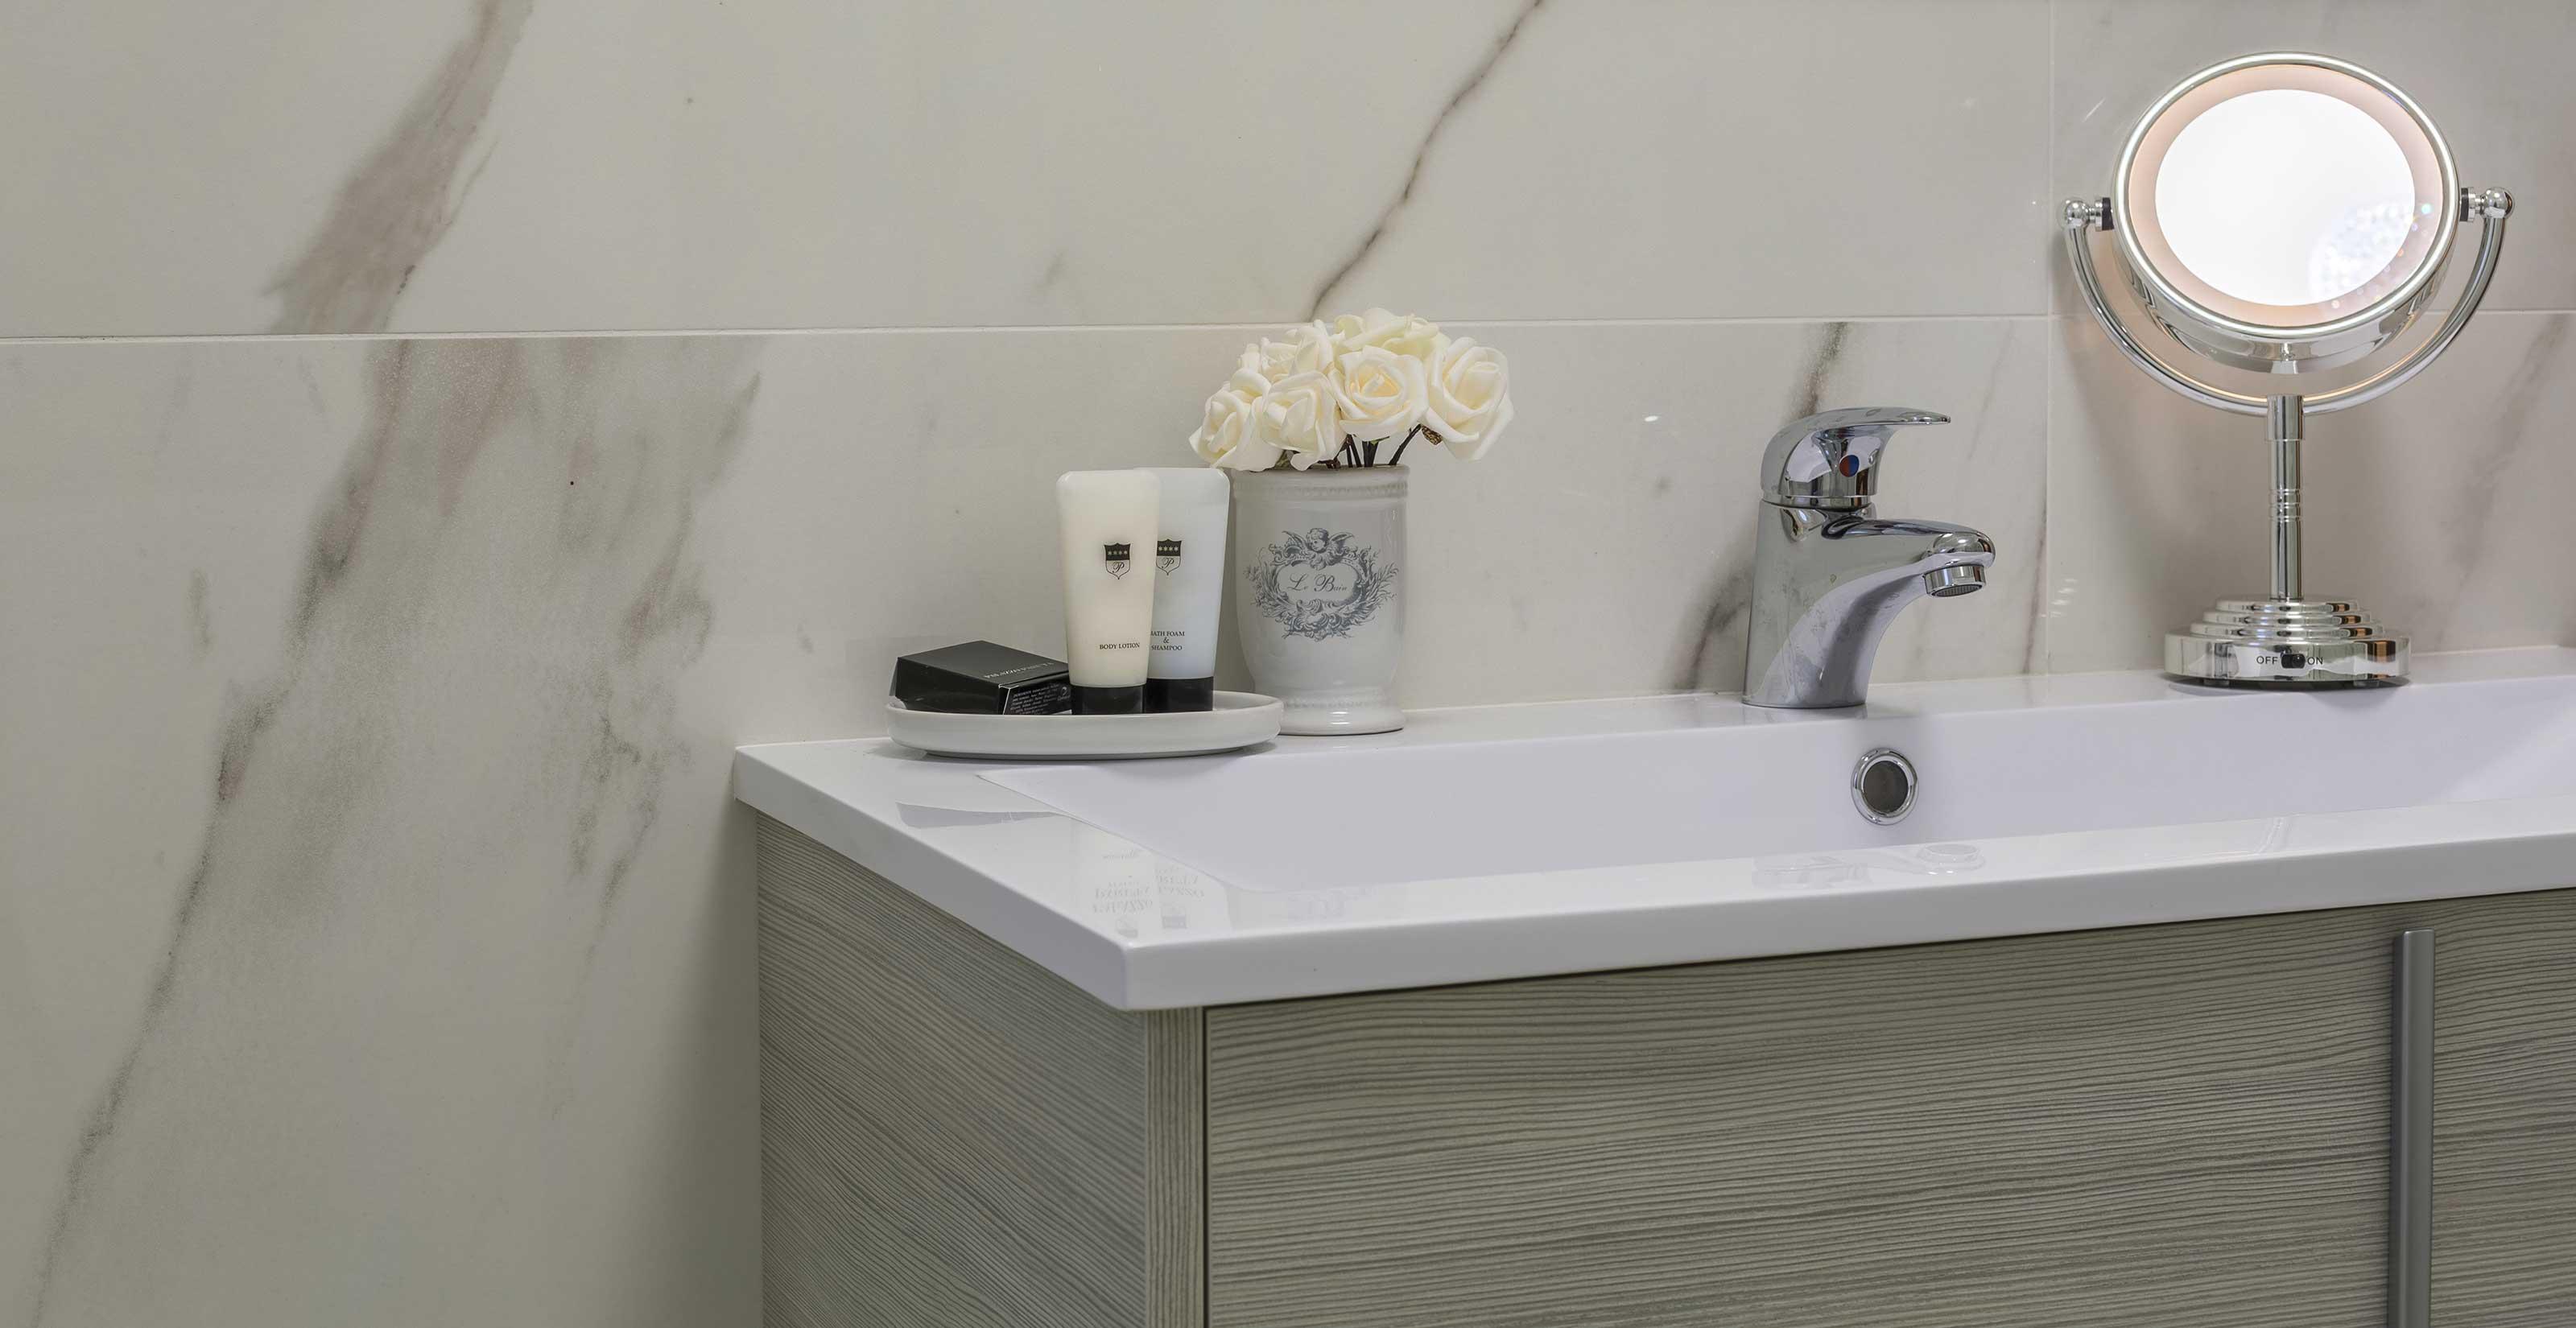 Benedetto Marcello - Vacation Rentals Apartments